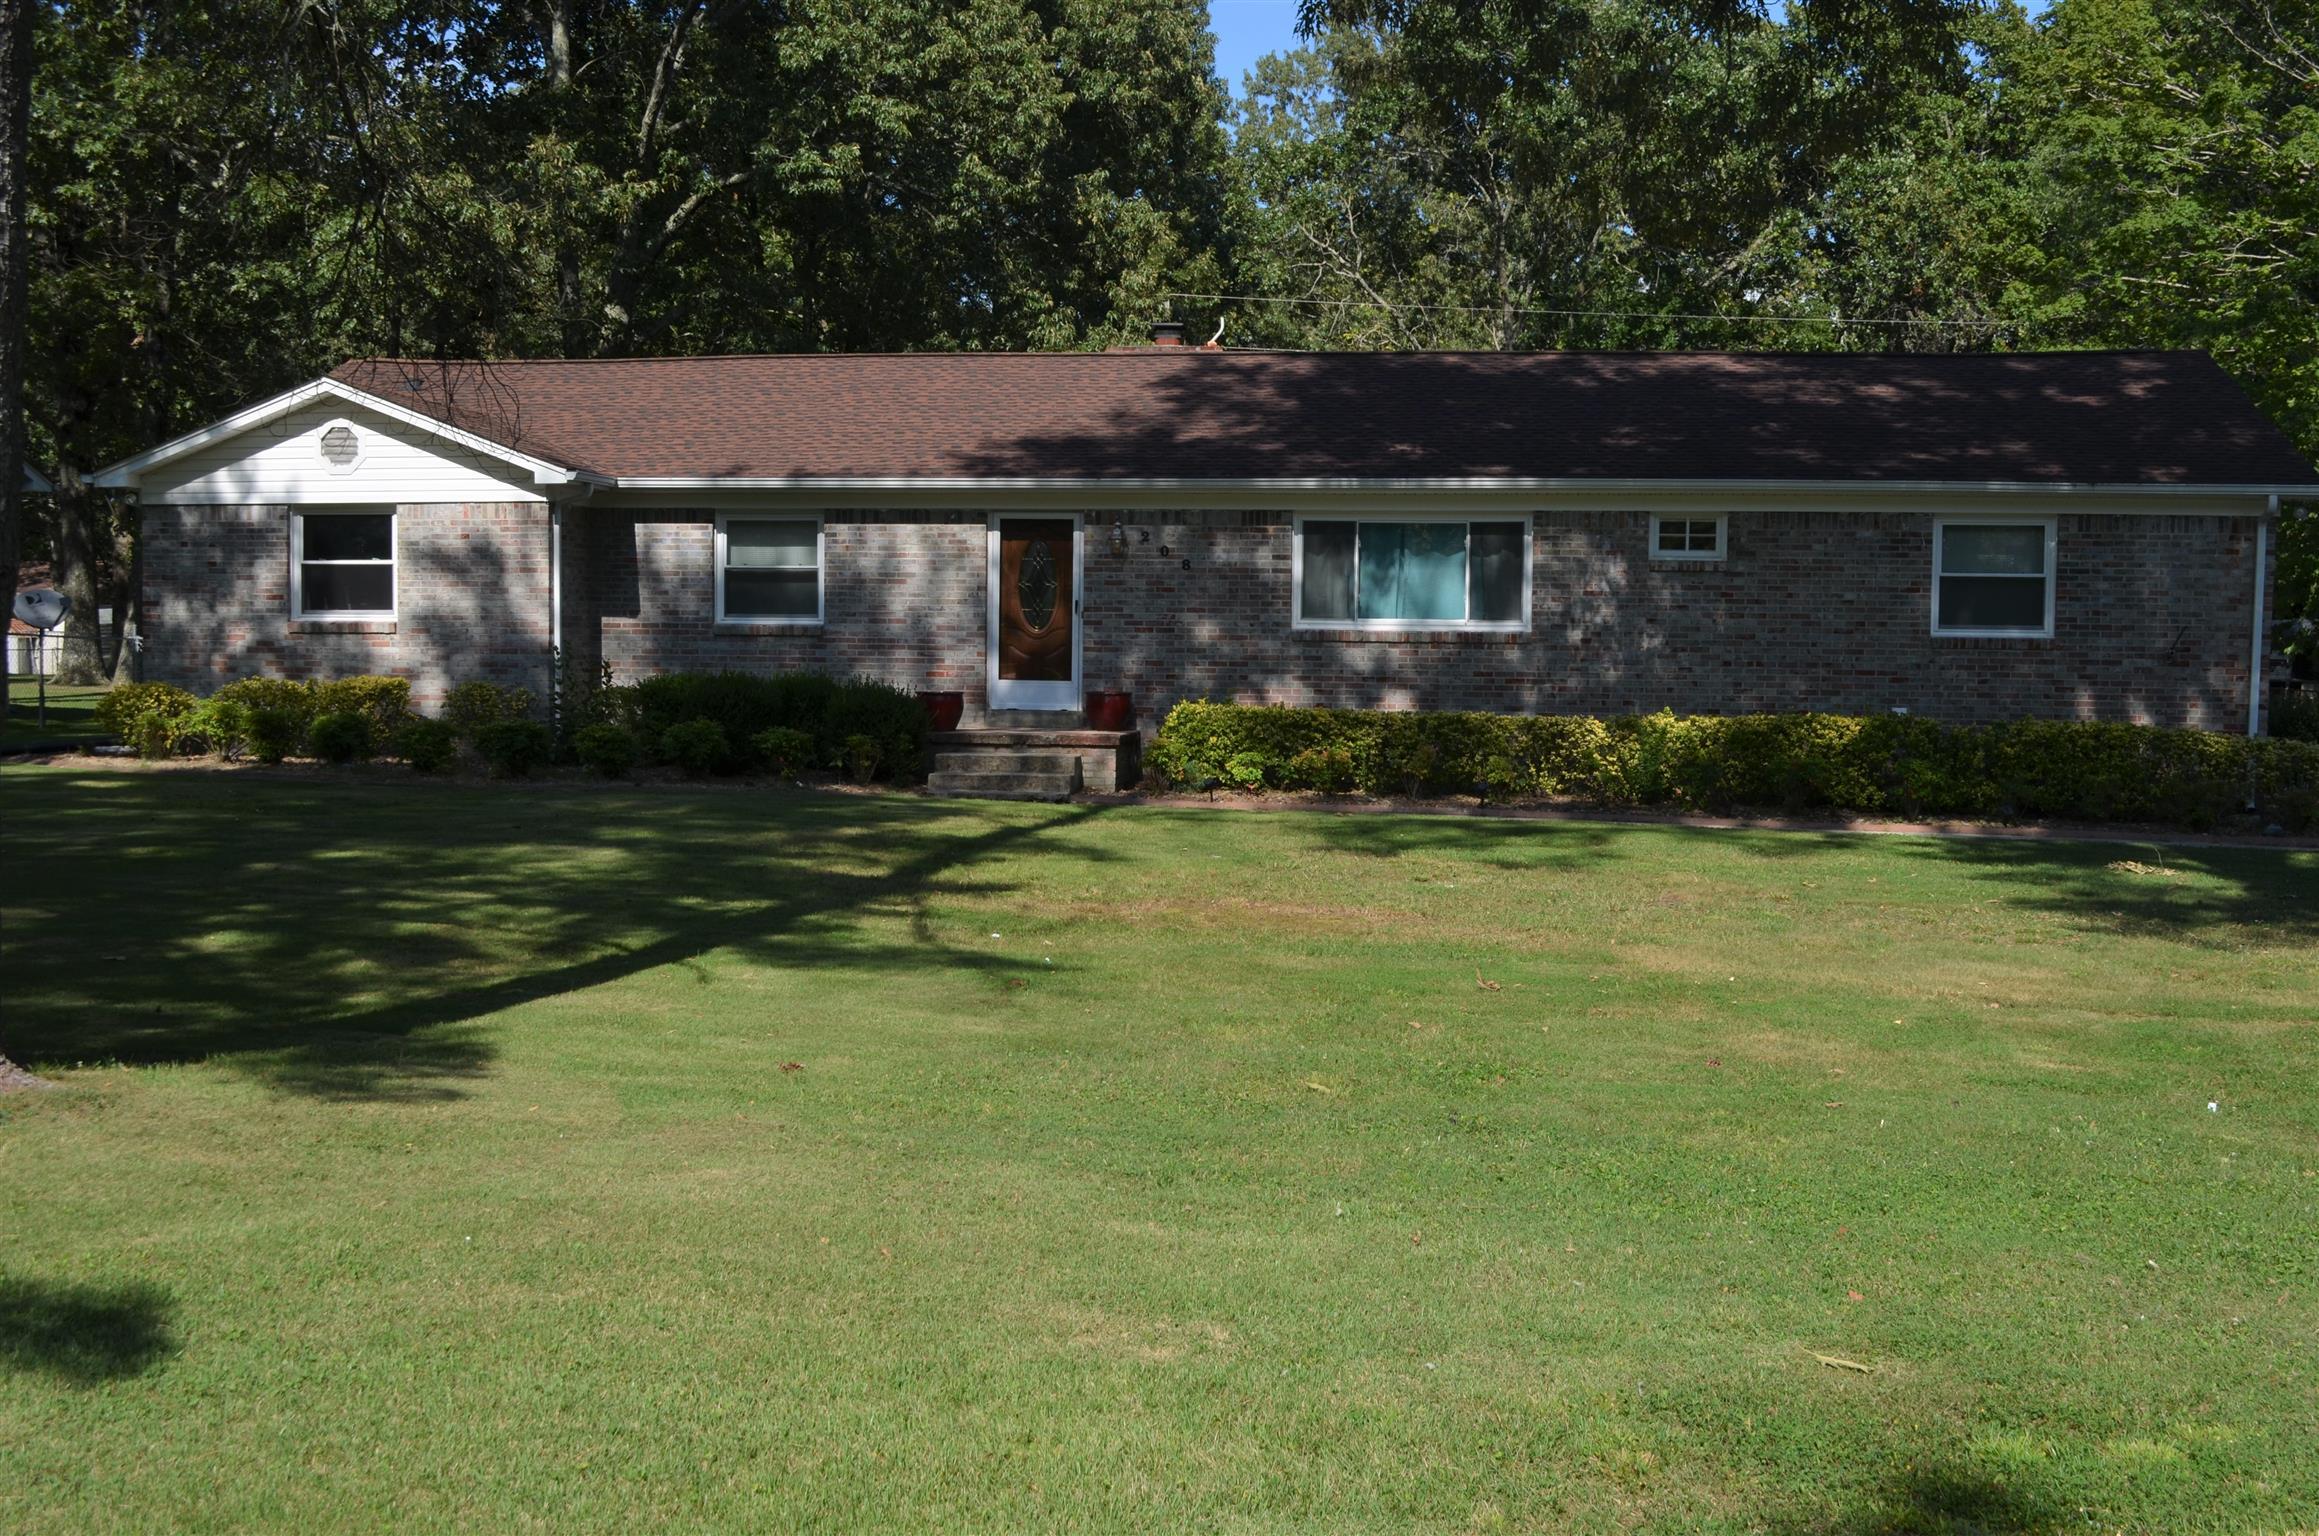 208 OLD FORT ST, Tullahoma, TN 37388 - Tullahoma, TN real estate listing